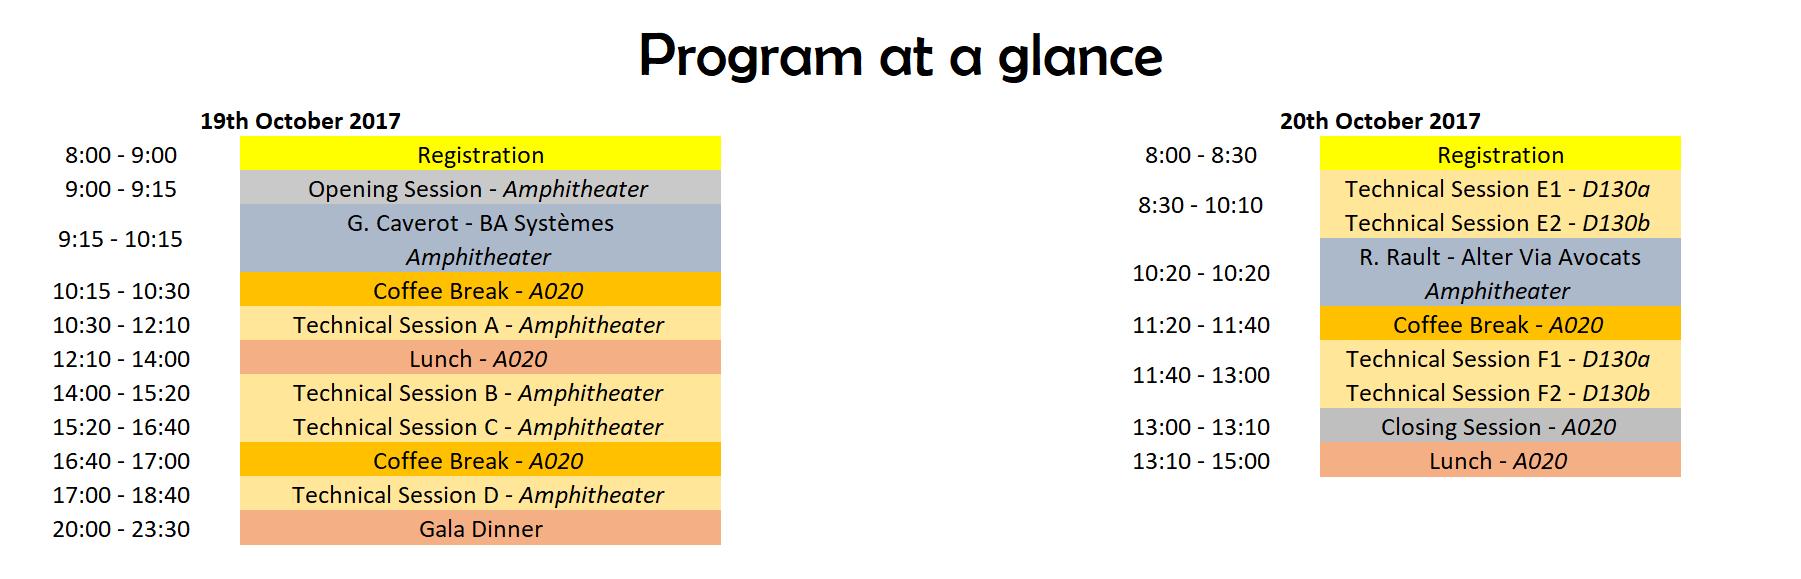 Program at a glance